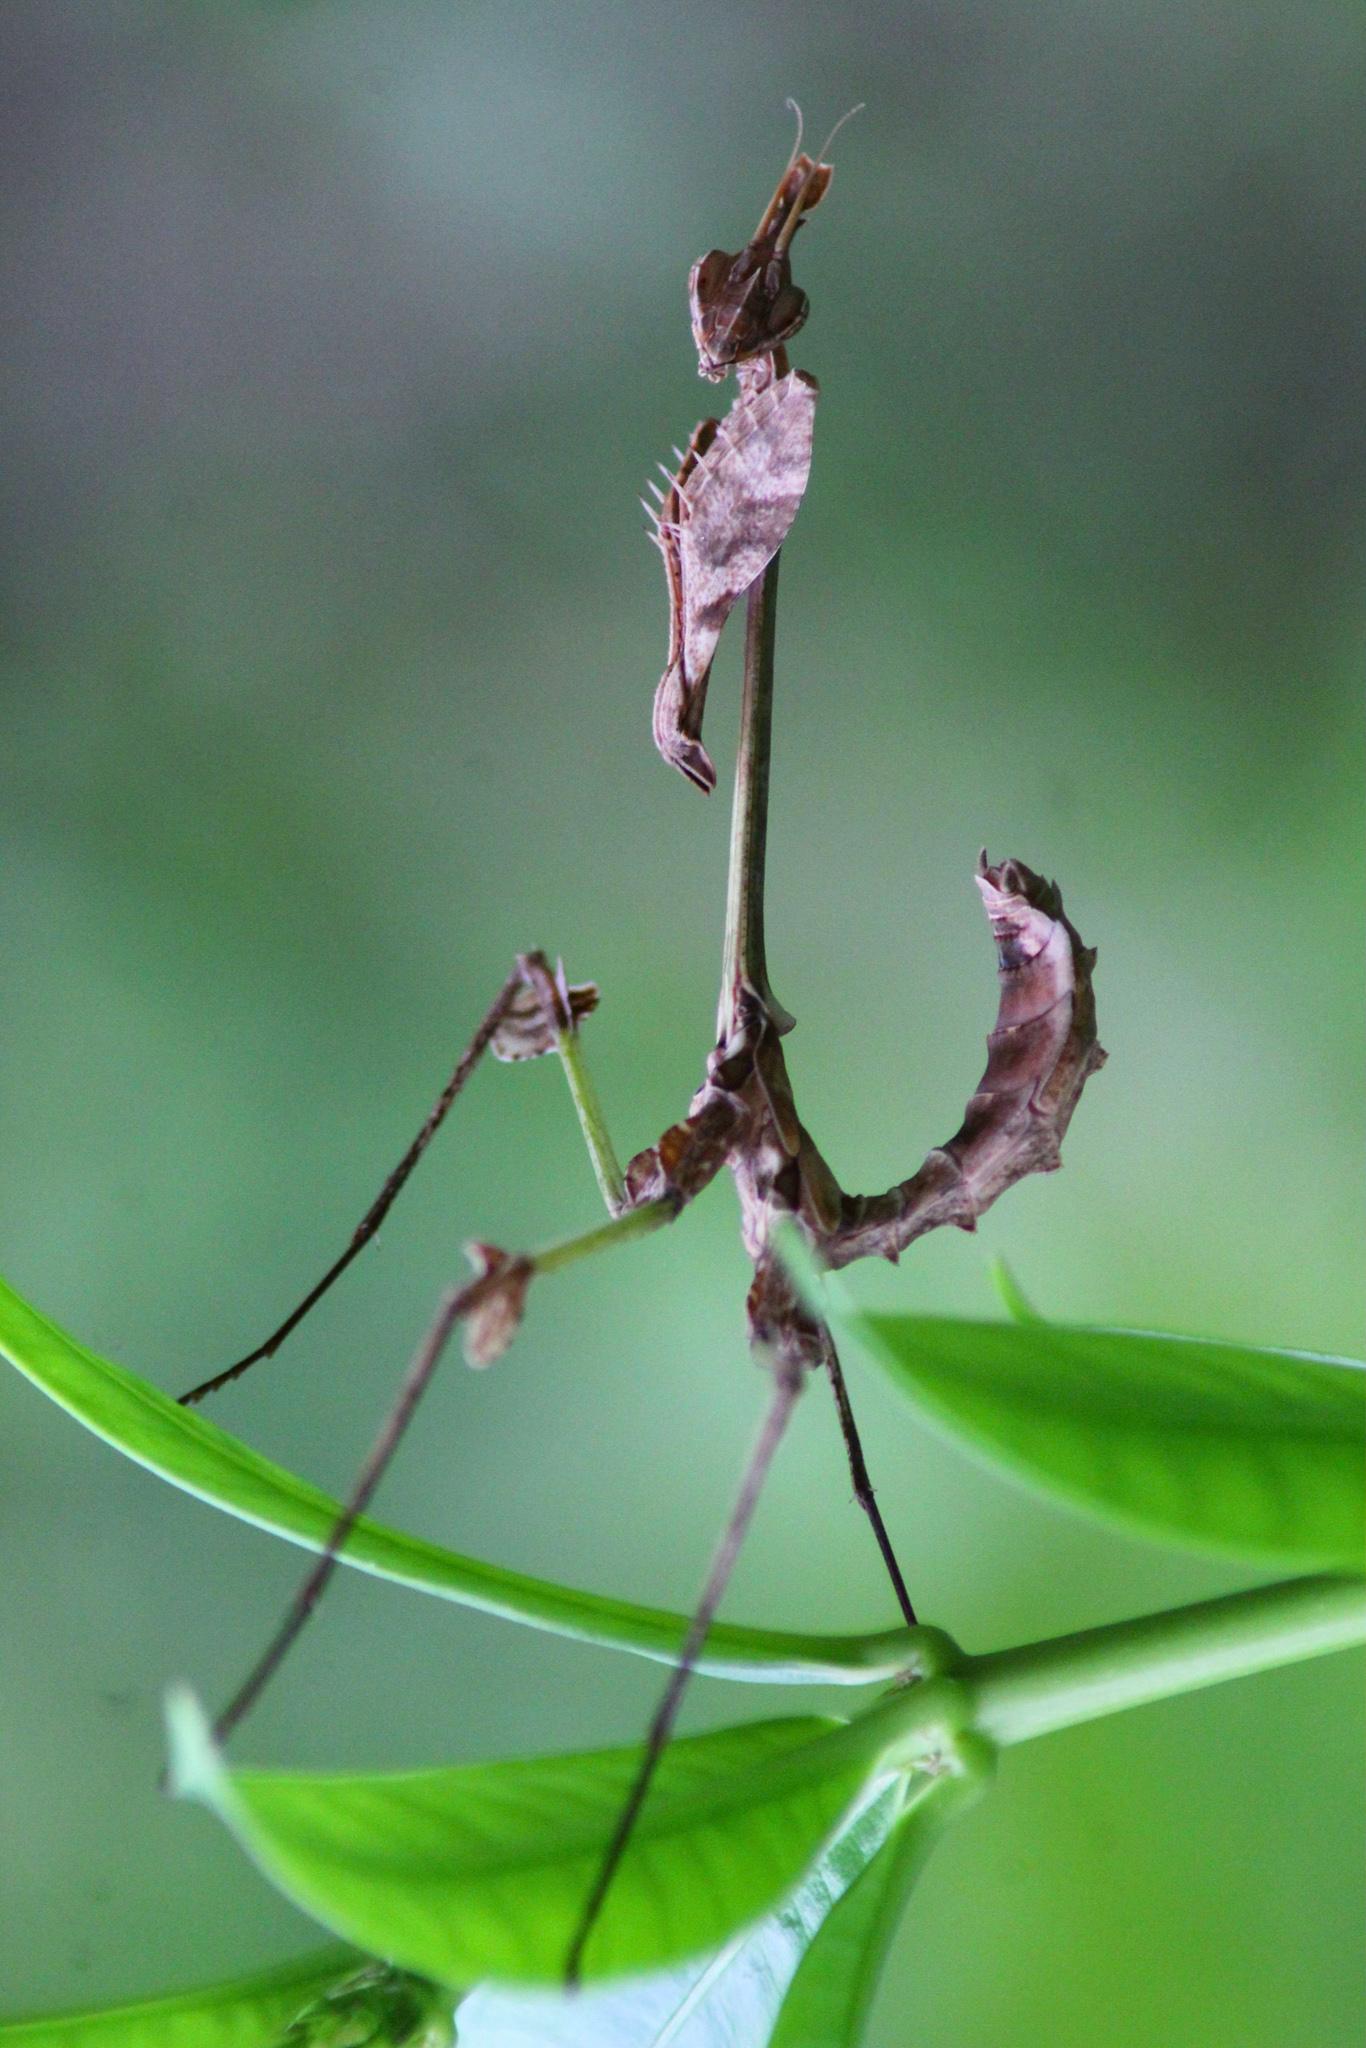 Mantis on Focus